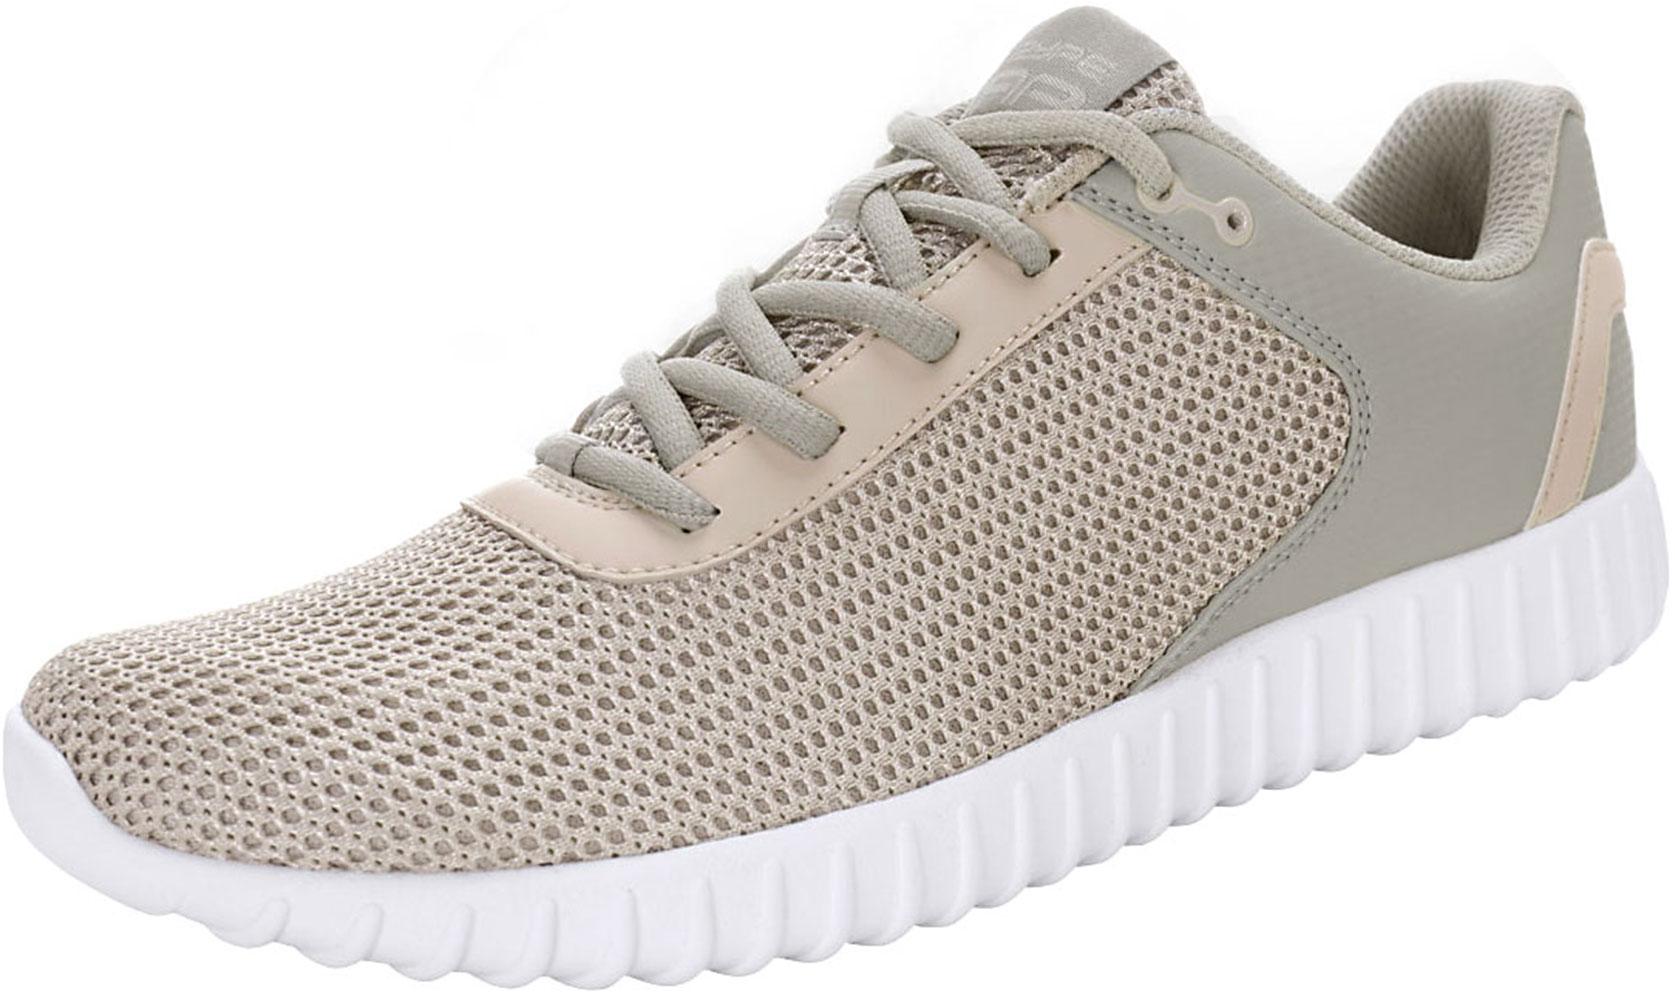 PYPE Women Contrast Color PU Panel Mesh Training Shoes Gray US 8